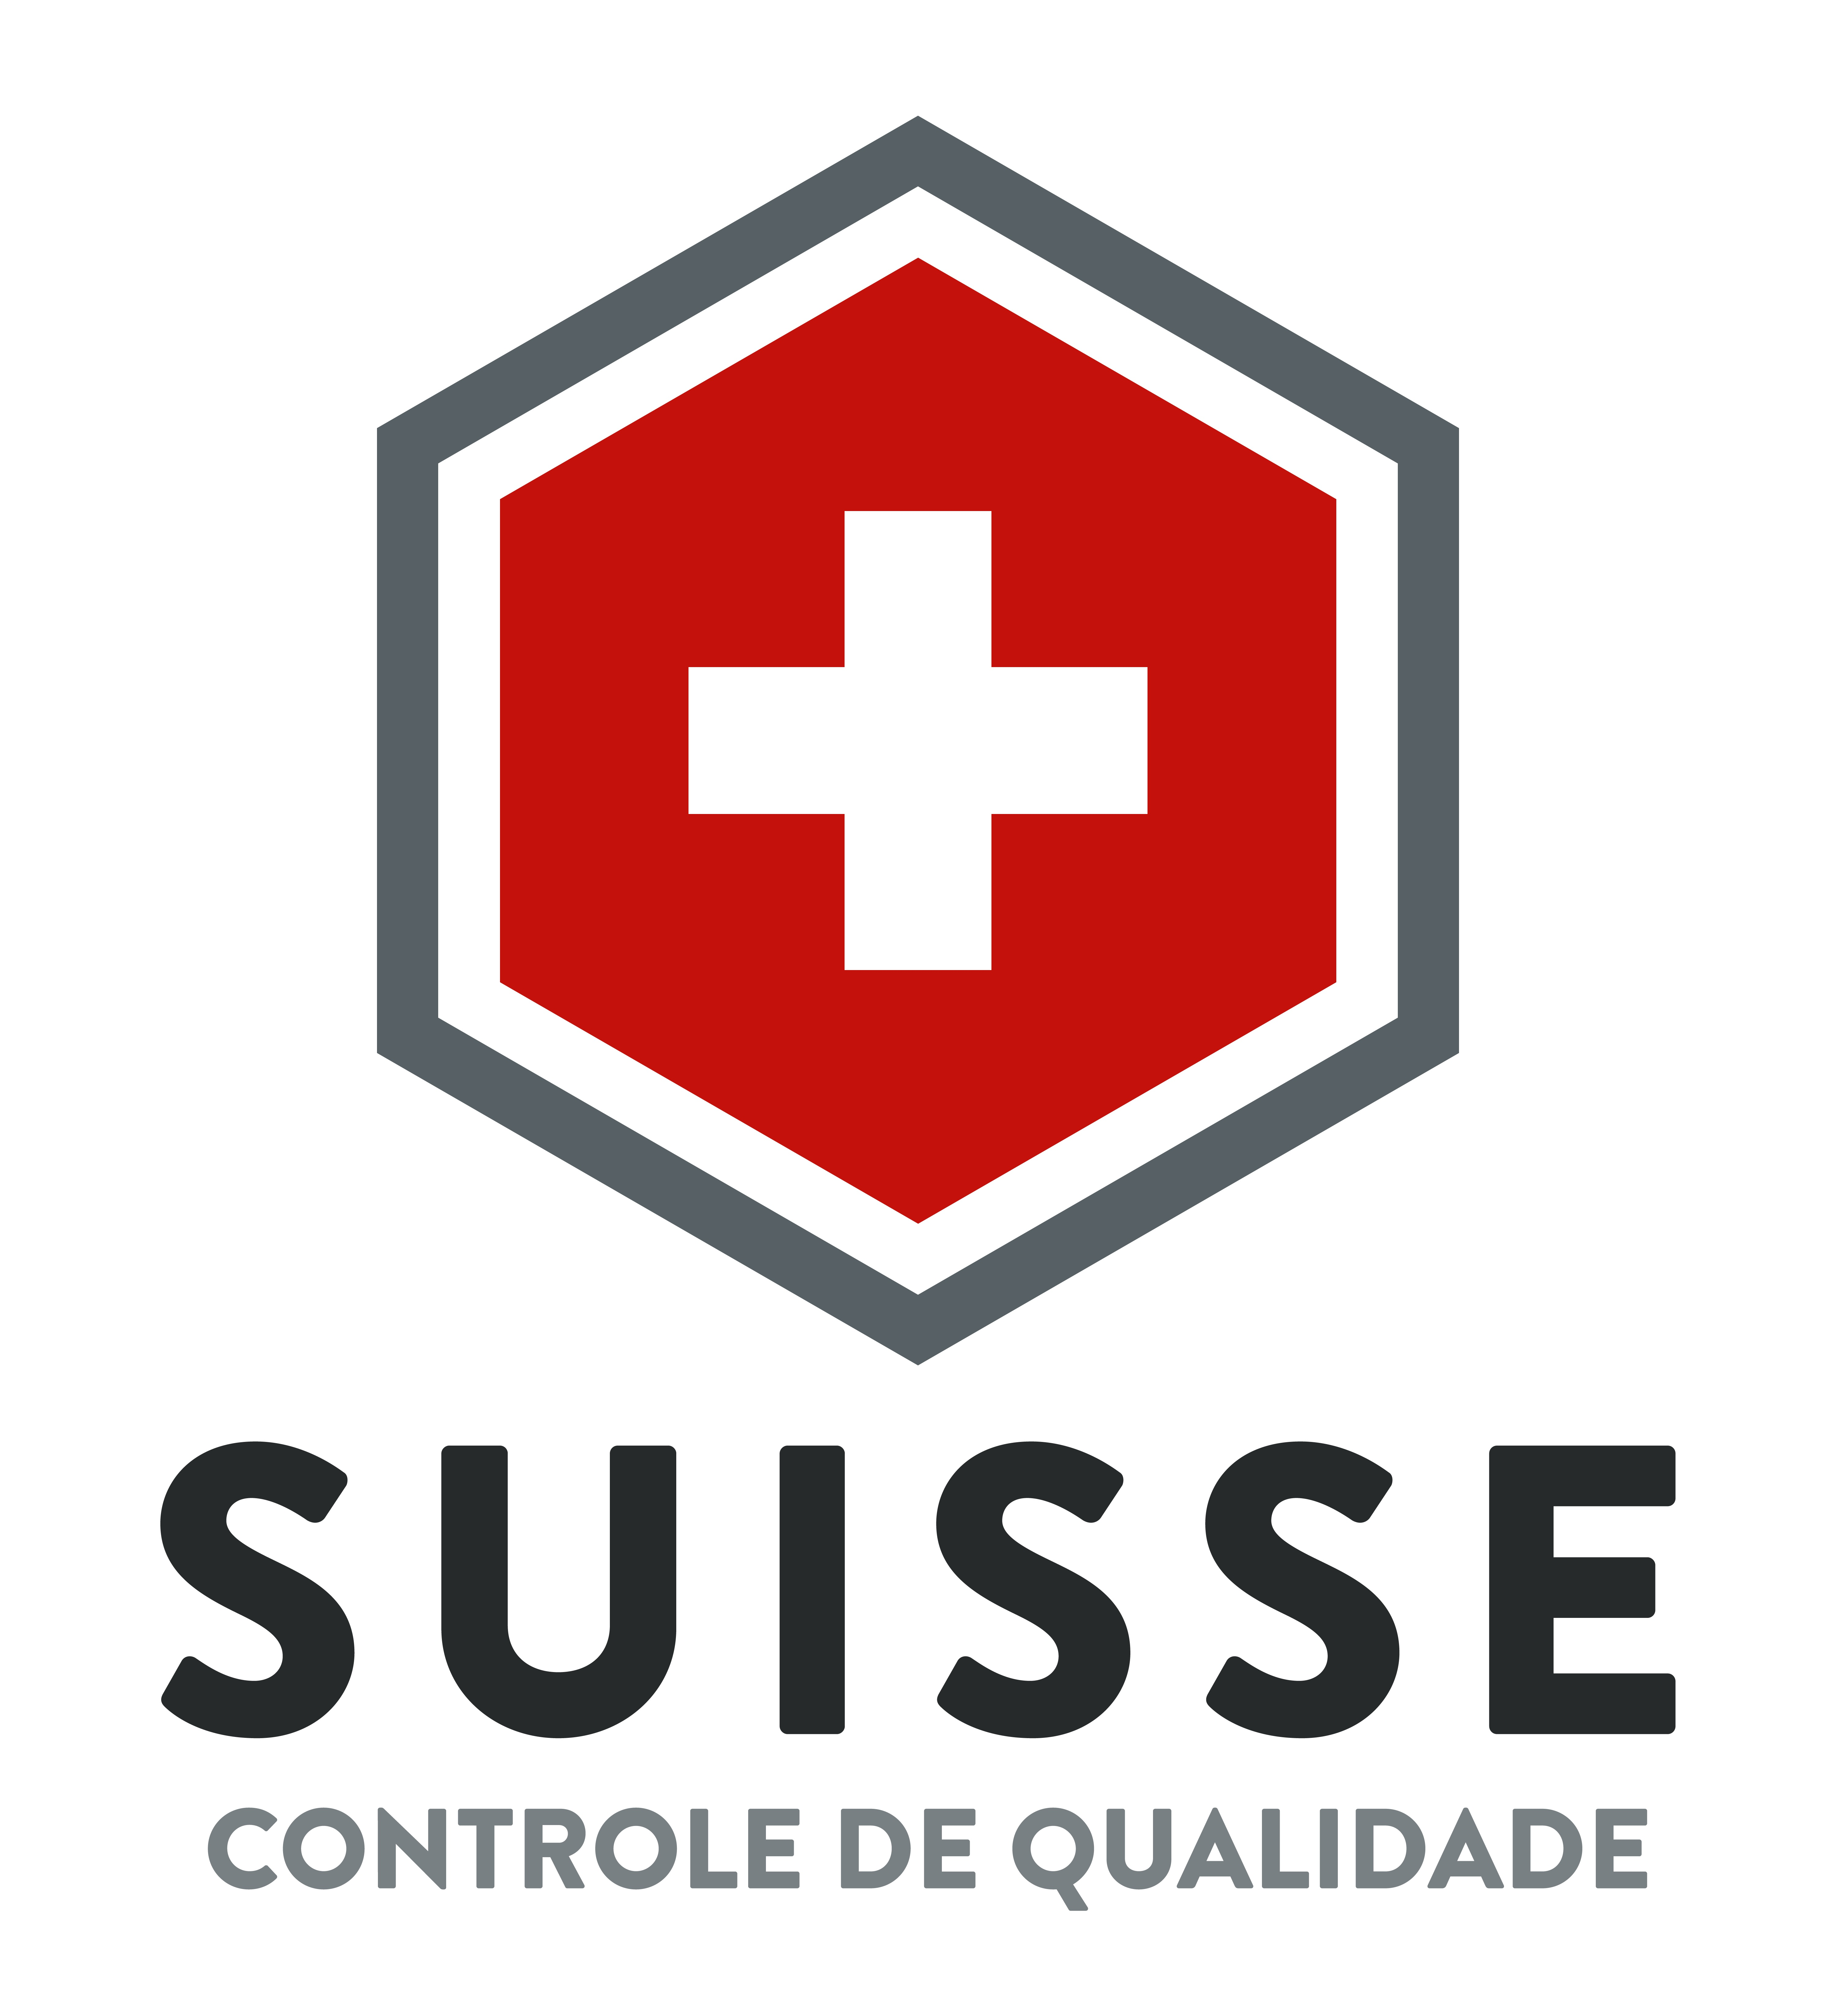 Suisse Controle de Qualidade